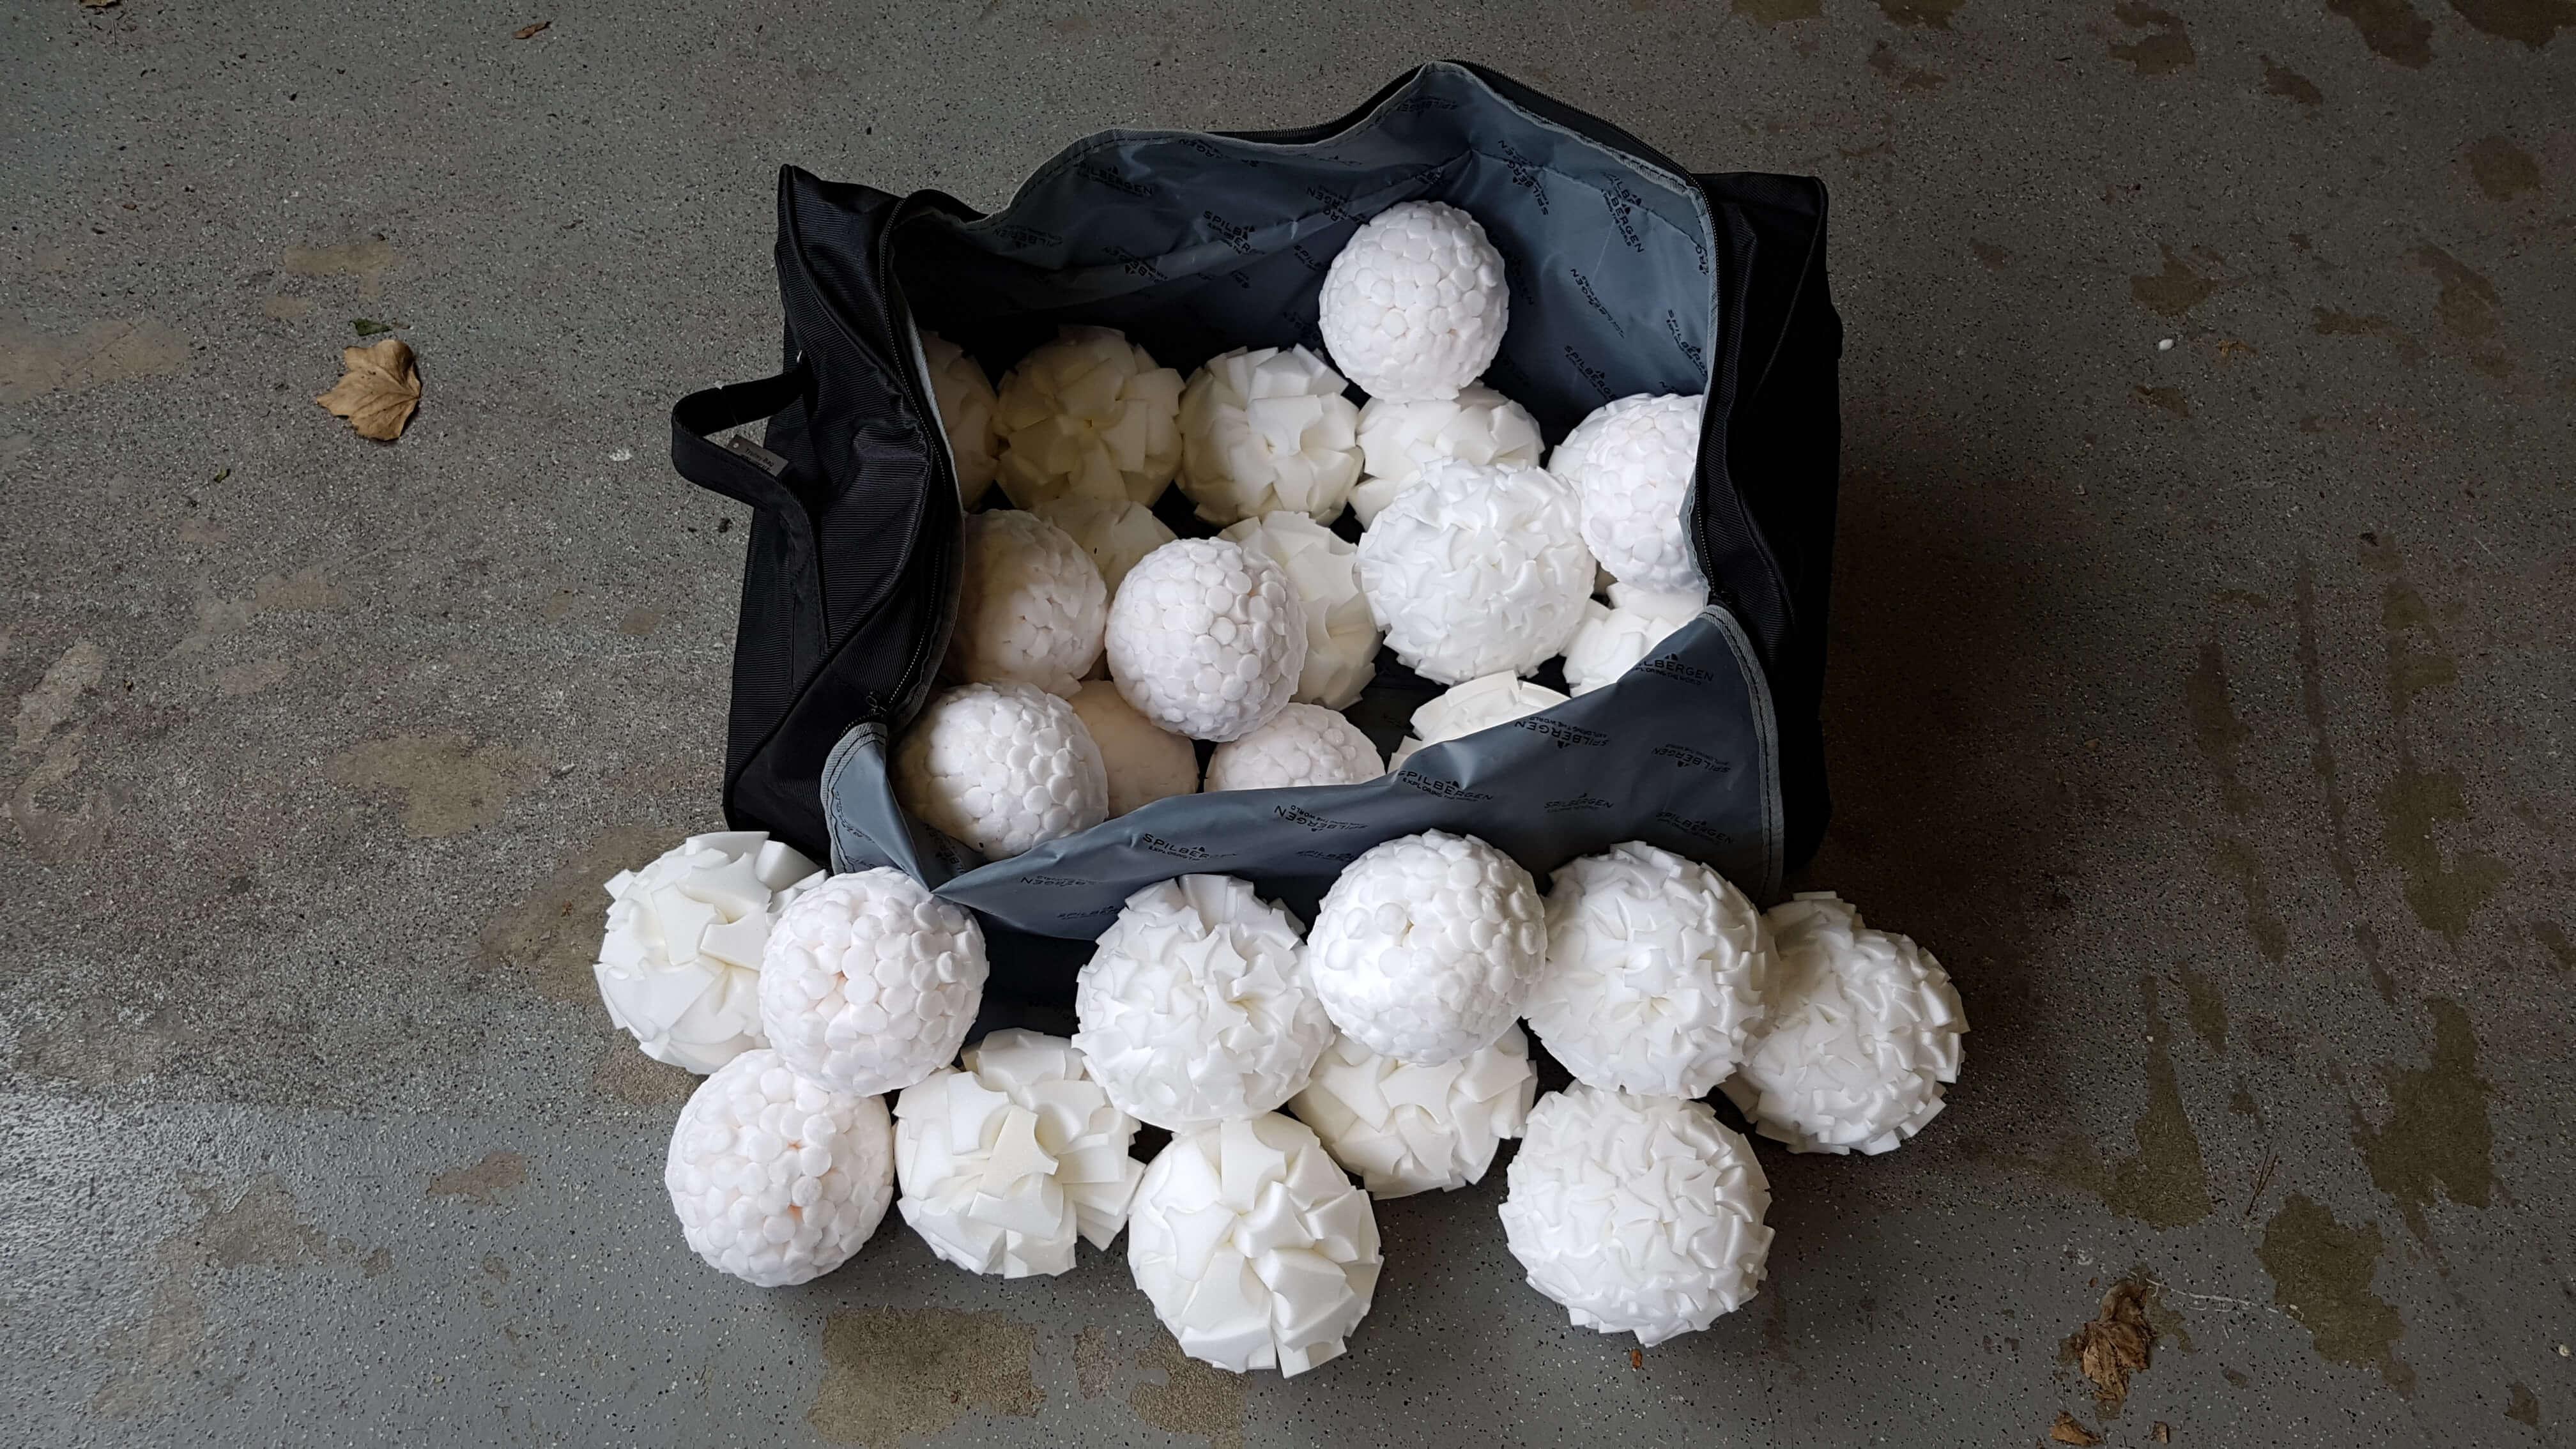 Sporttas met 27 Droge Sneeuwballen